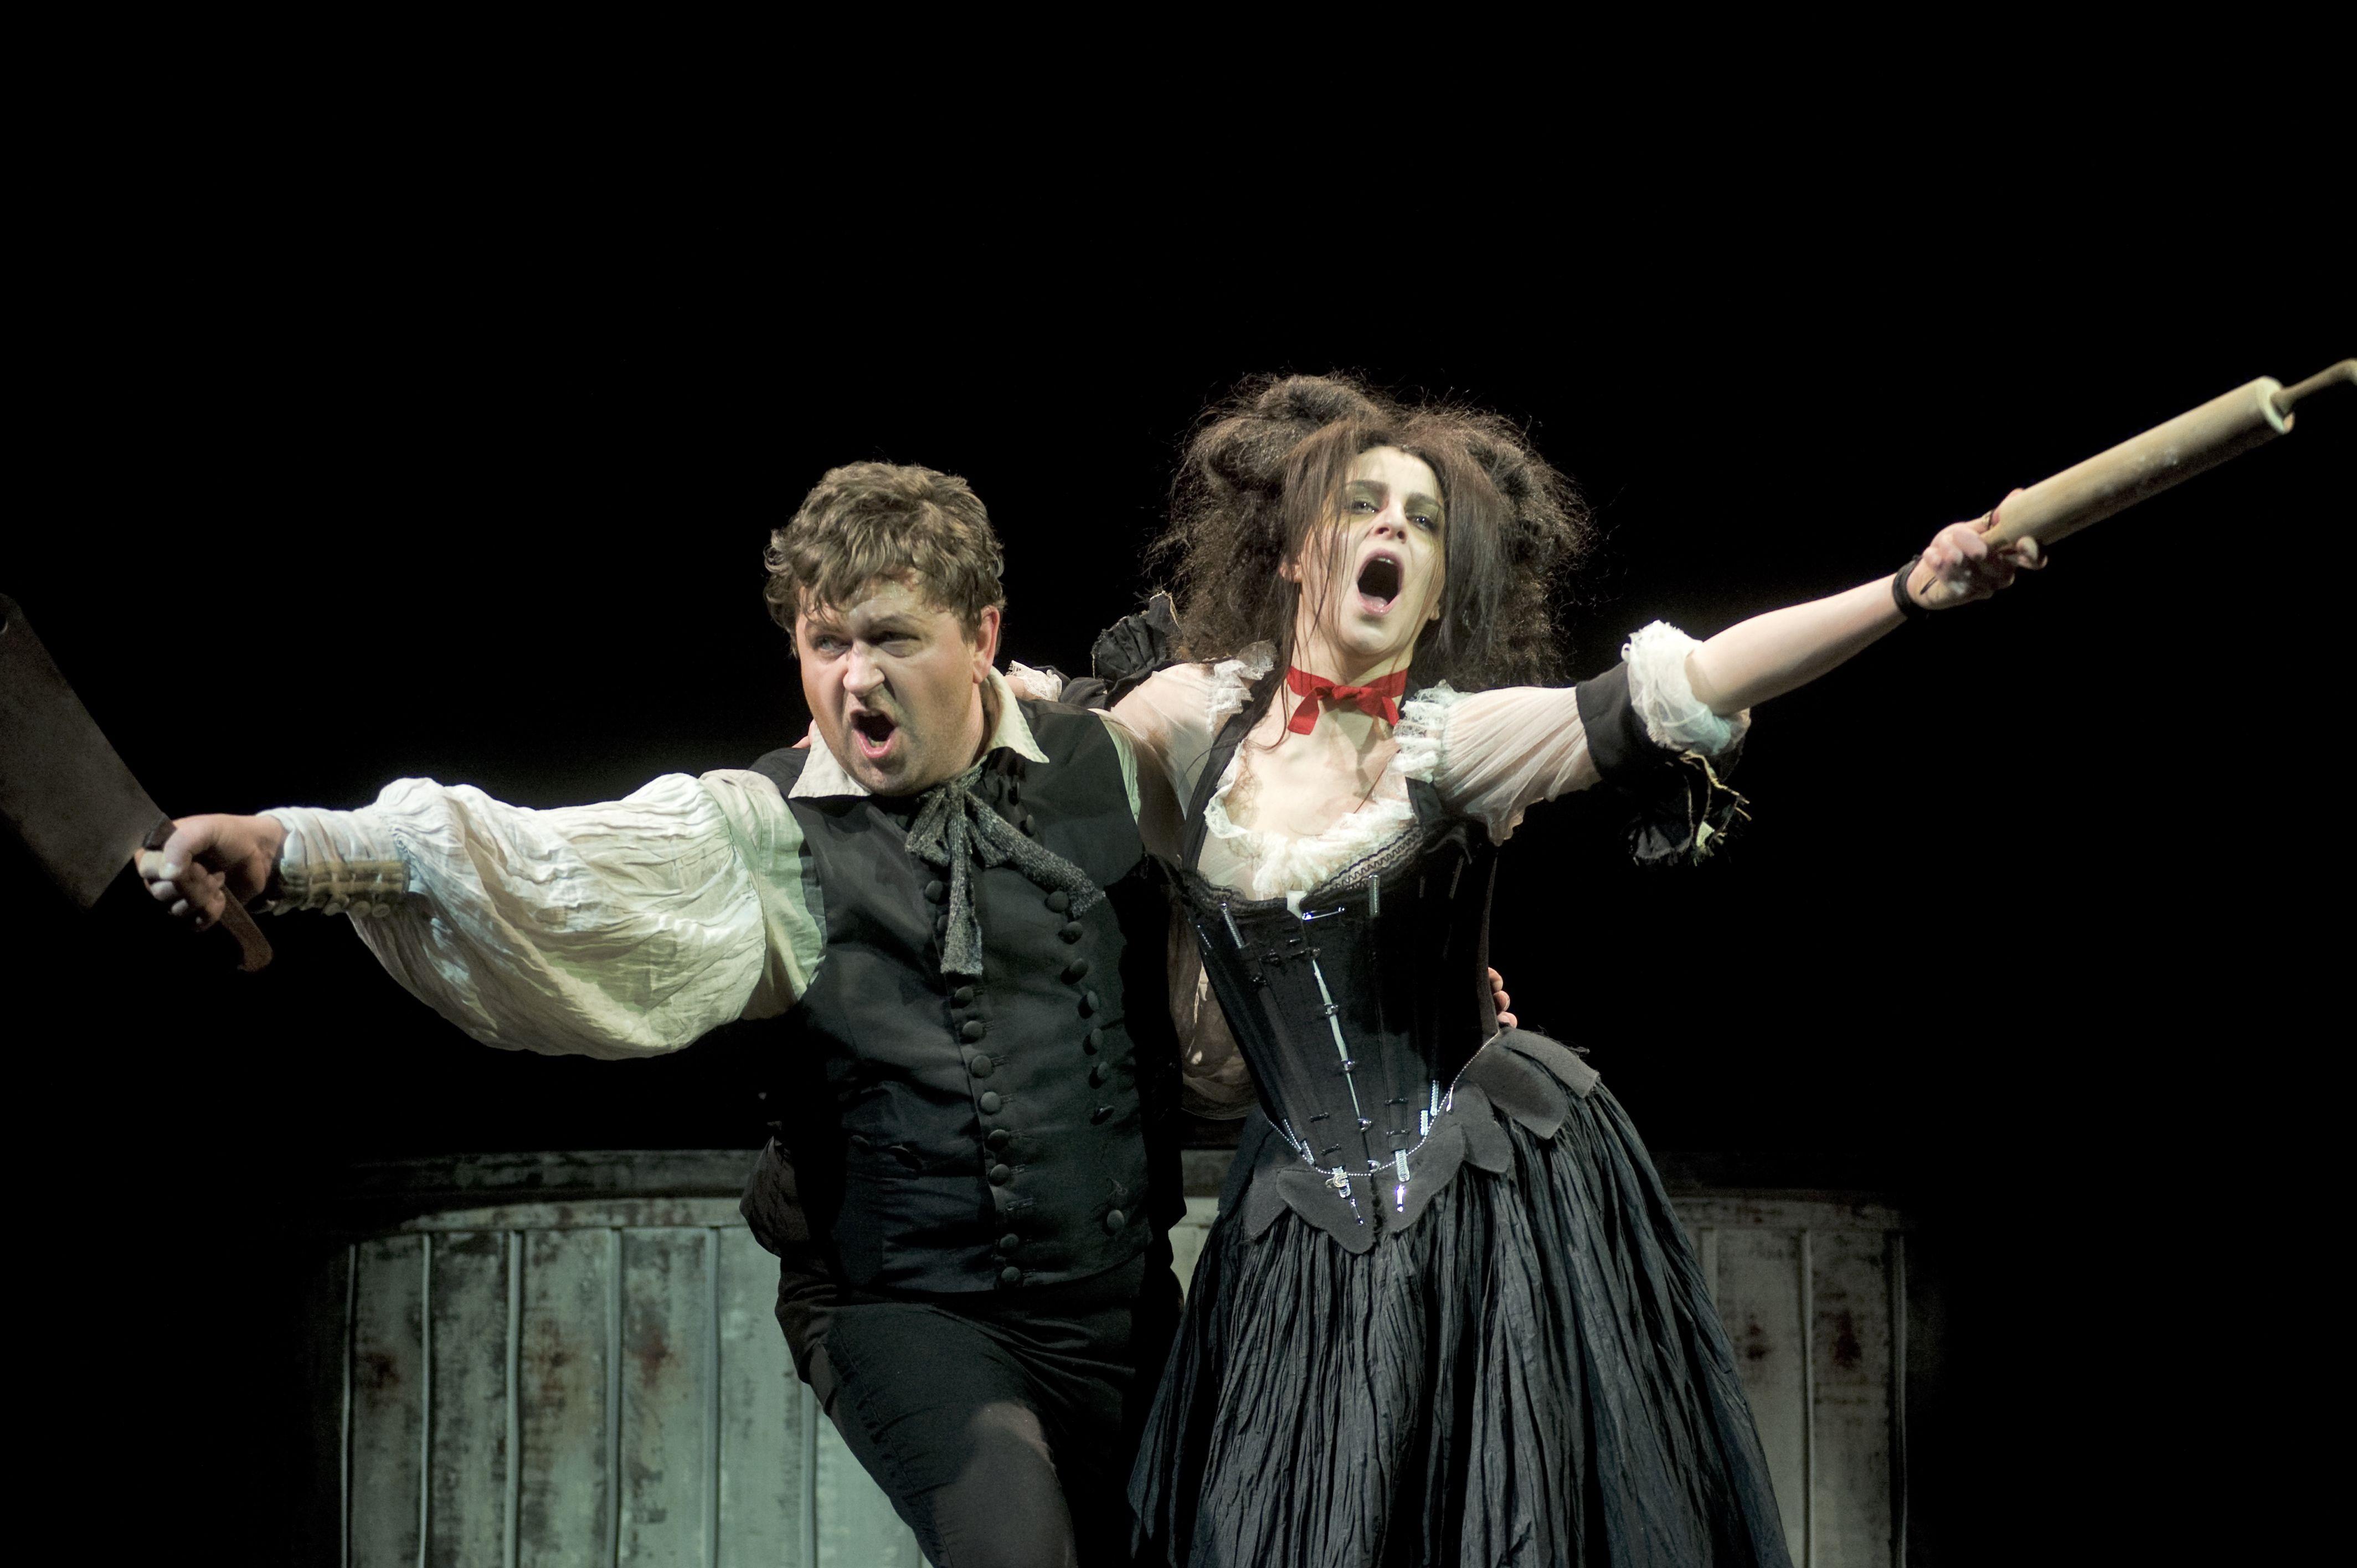 Dainius Stumbras & Asmik Grigorian singing their hearts out.  Photo by D. Matvejev.